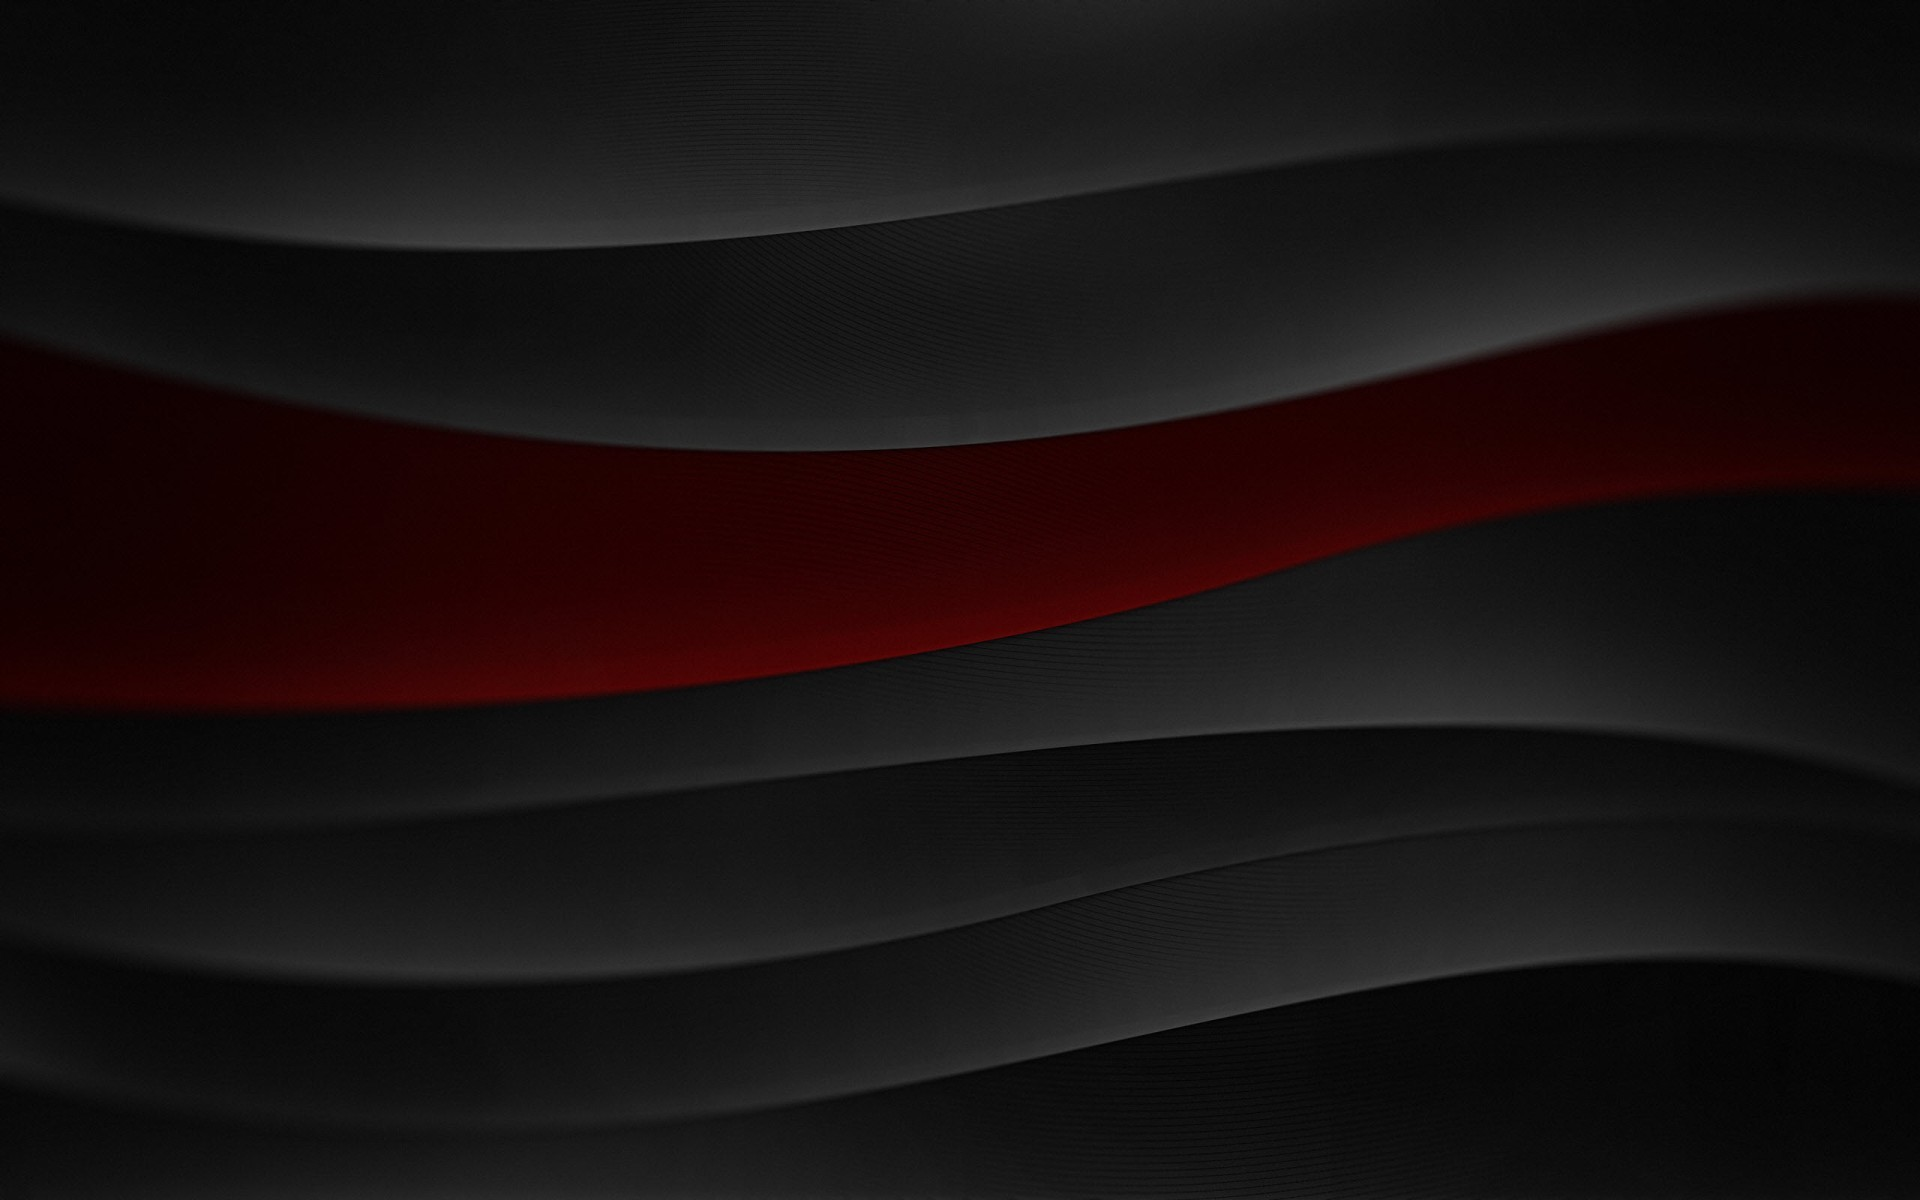 red wallpaper РȘk p̴ Google   wallpapers   Pinterest   Red wallpaper and  Wallpaper